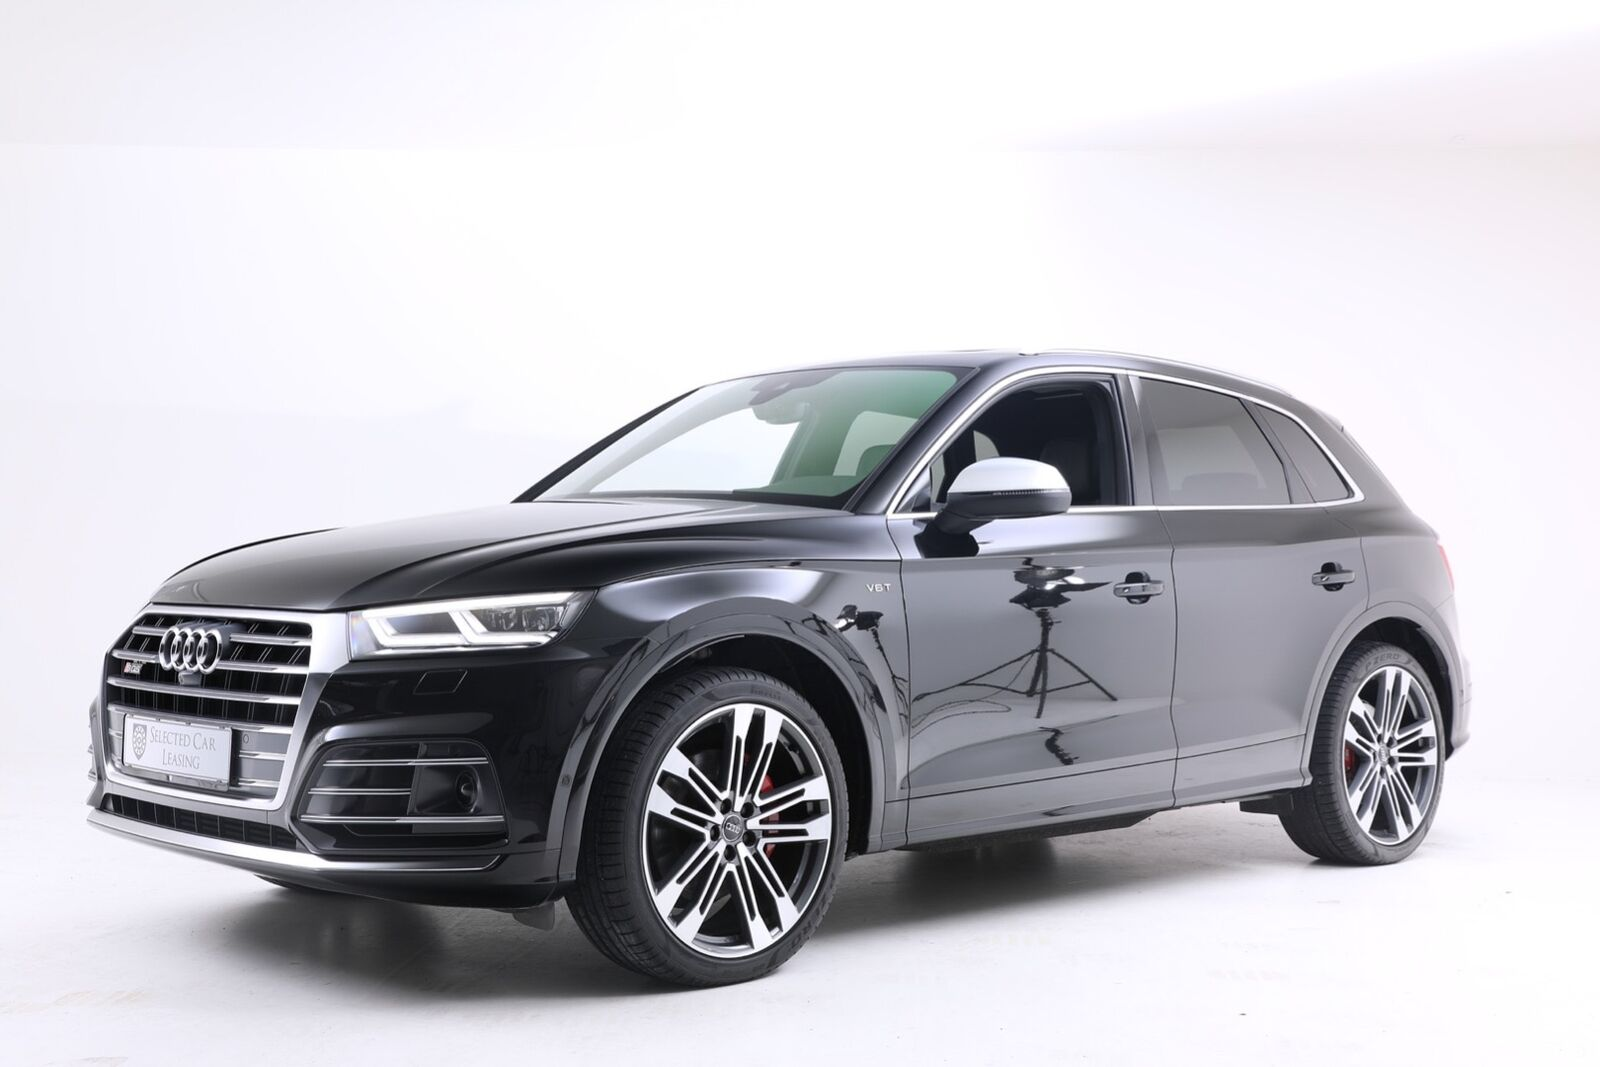 Audi SQ5 3,0 TFSi quattro Tiptr. 5d - 5.019 kr.